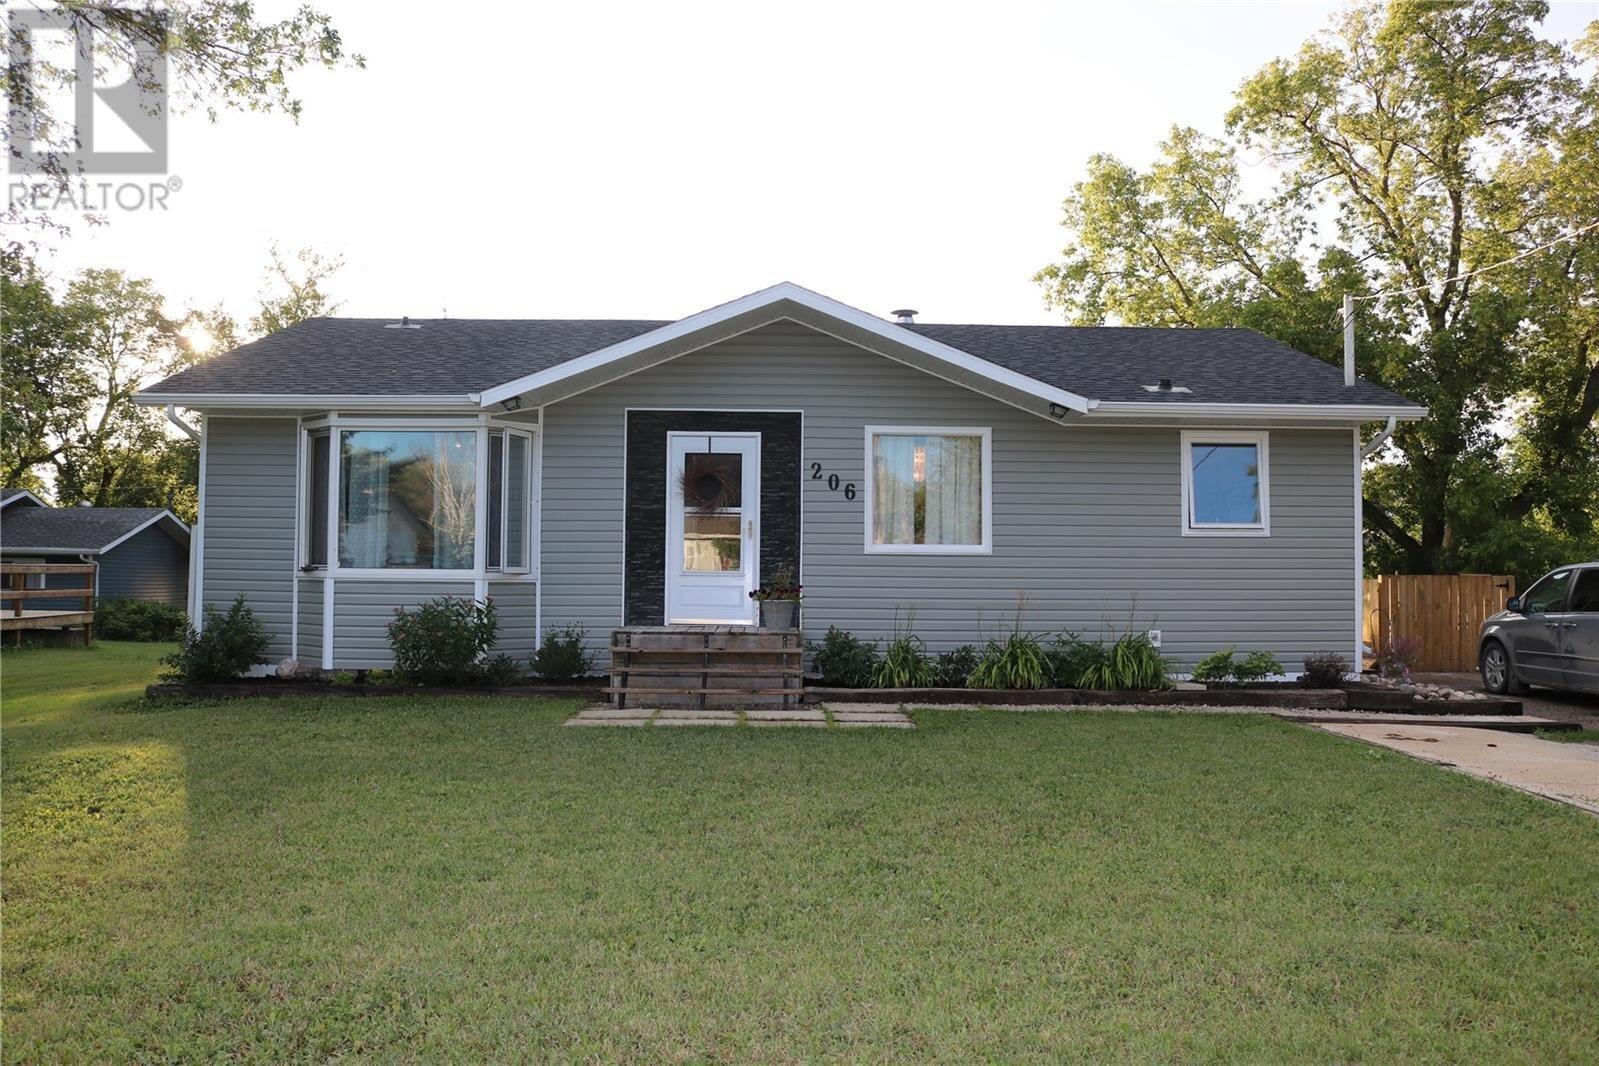 House for sale at 206 Pitt St Rocanville Saskatchewan - MLS: SK821769